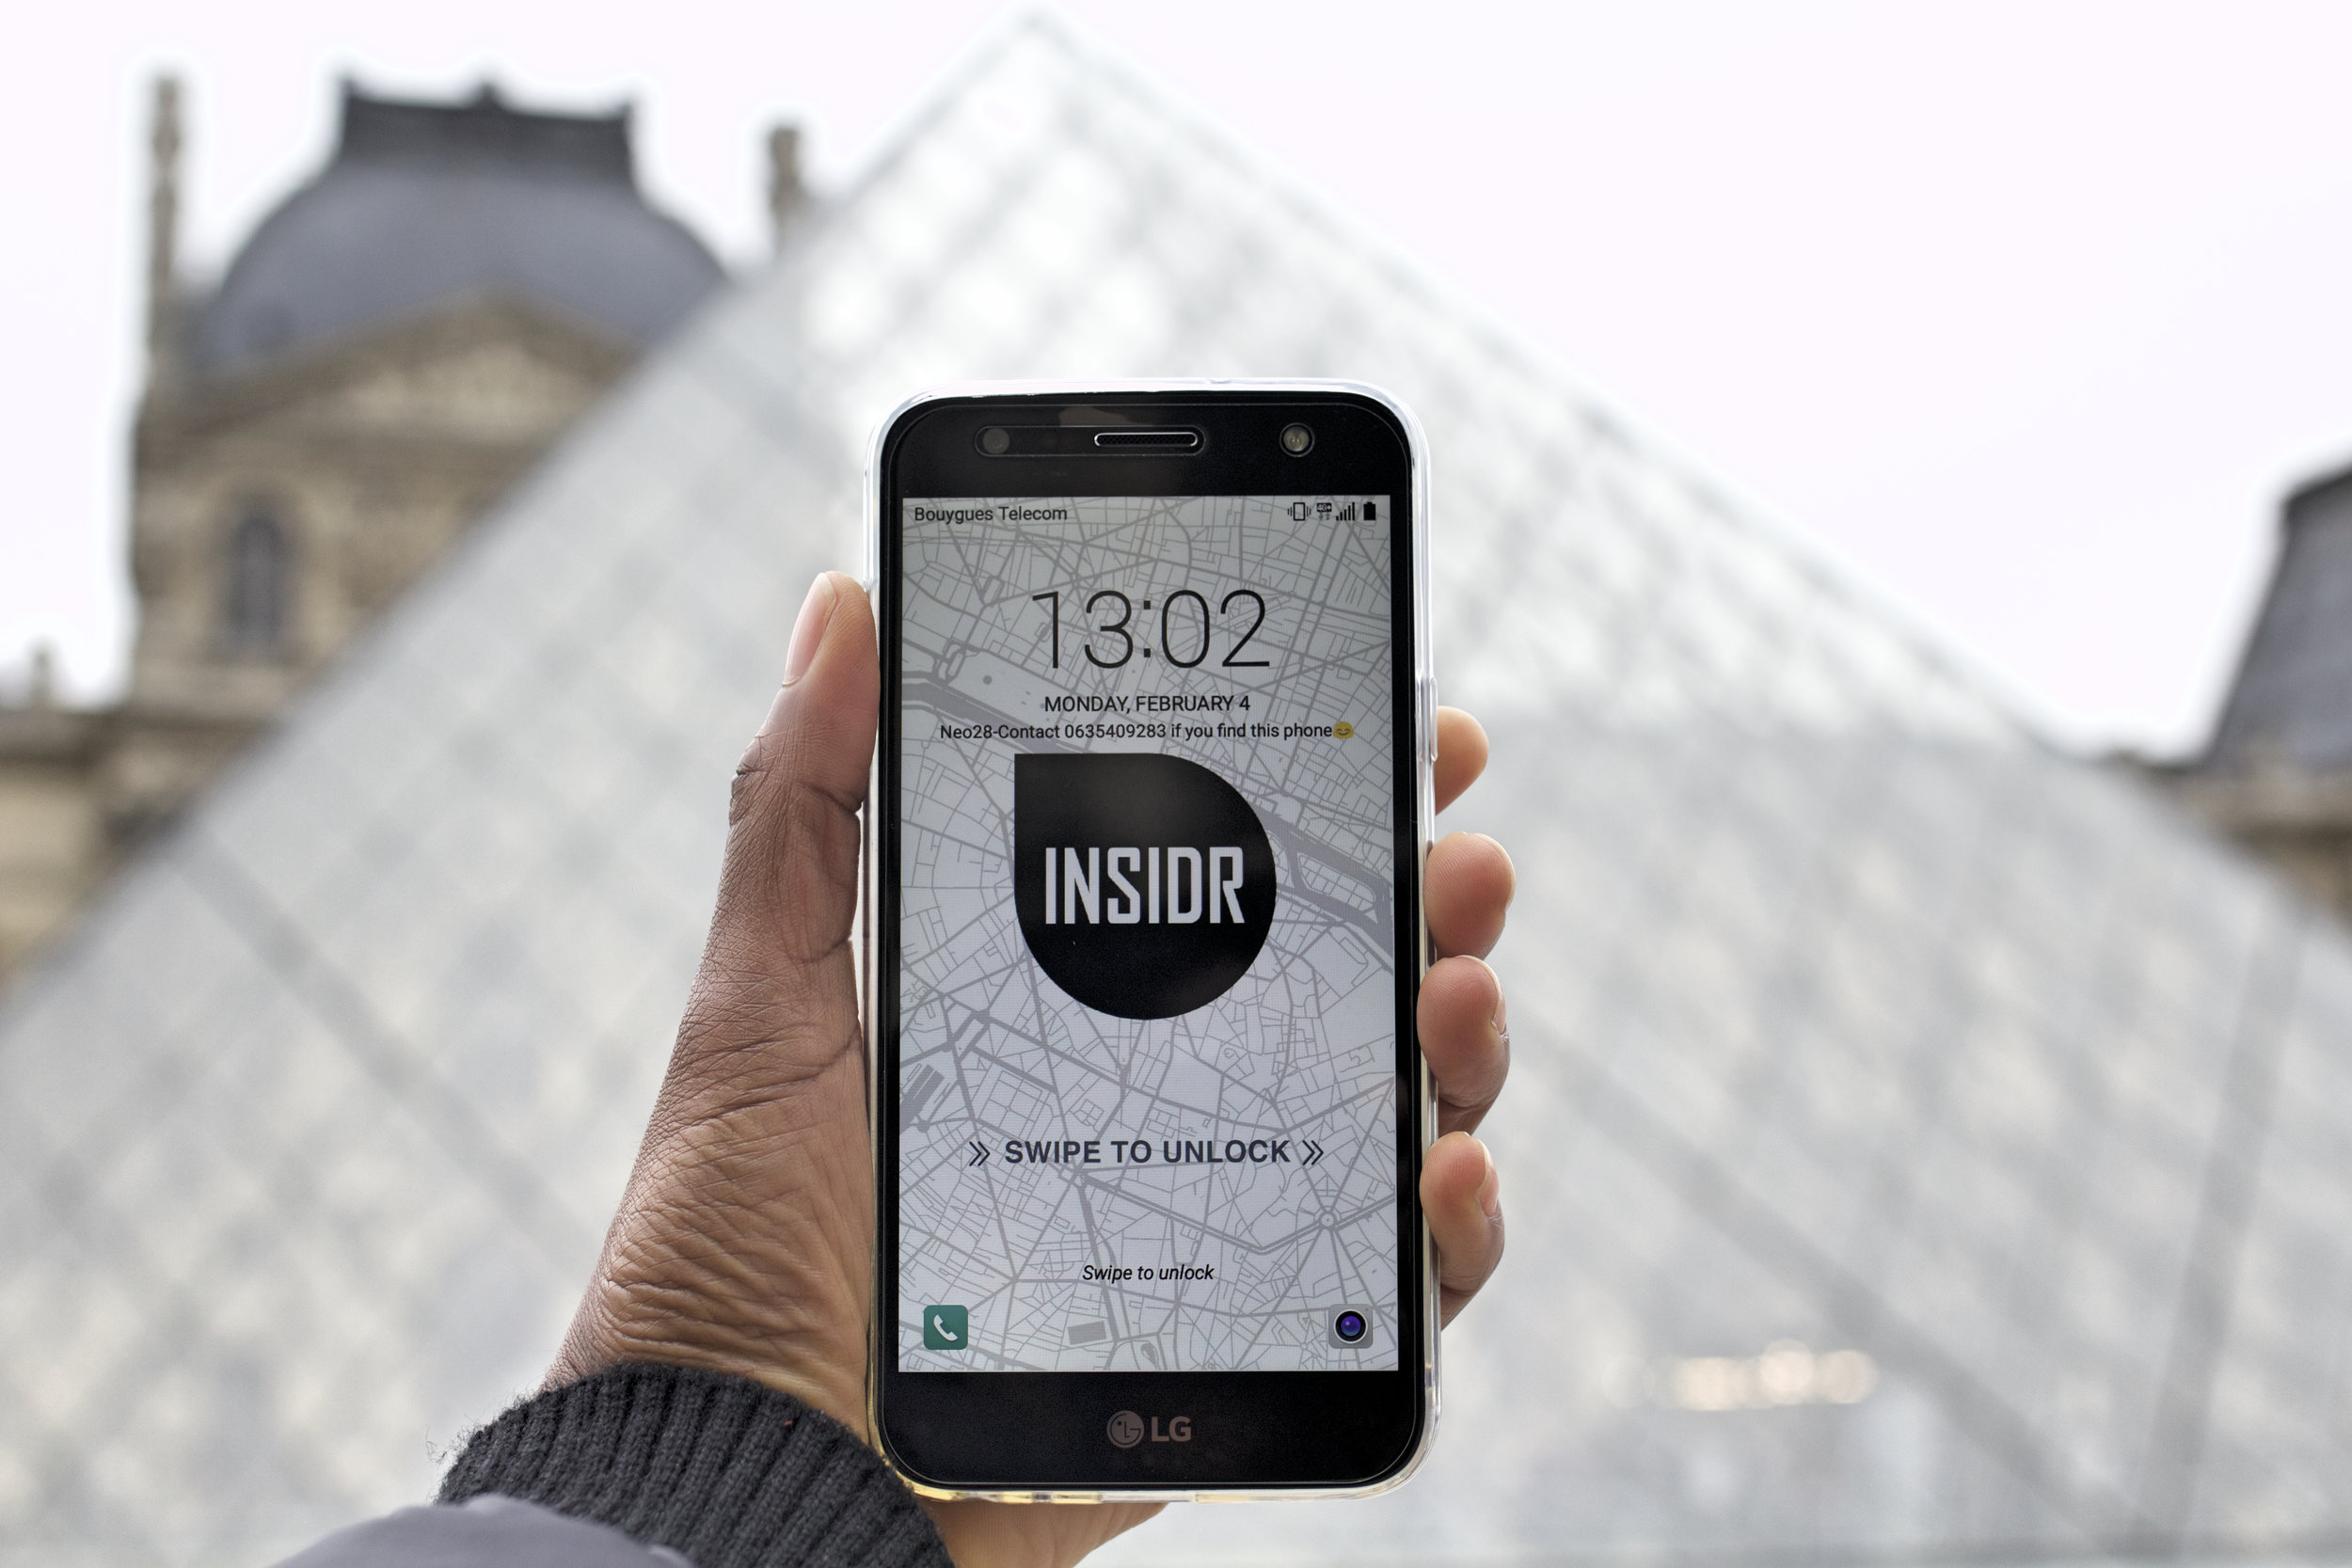 Insidr Louvre.jpg